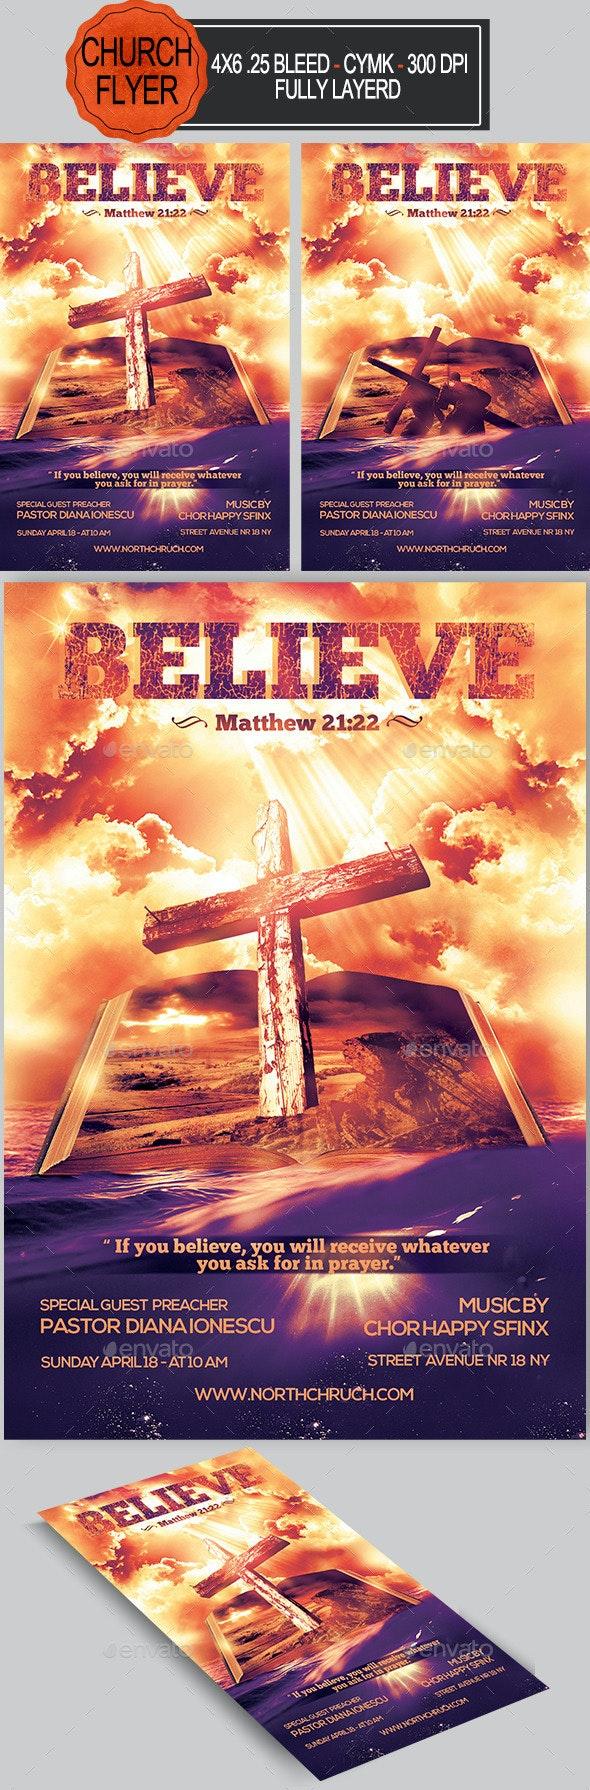 Believe Church Flyer   - Church Flyers